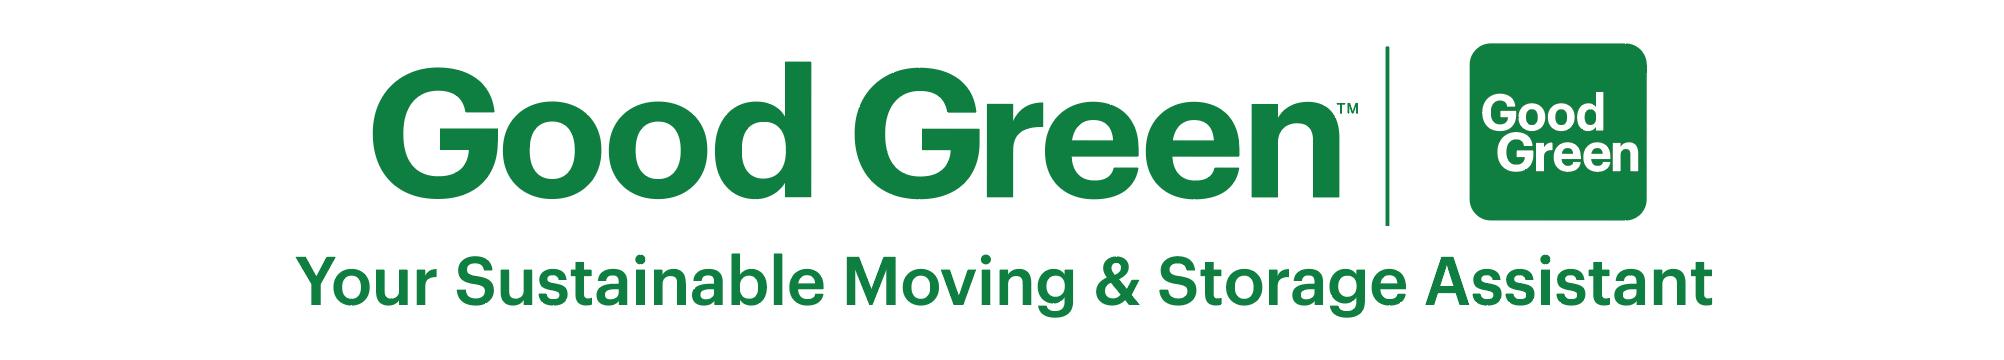 Good Green Moving Logo